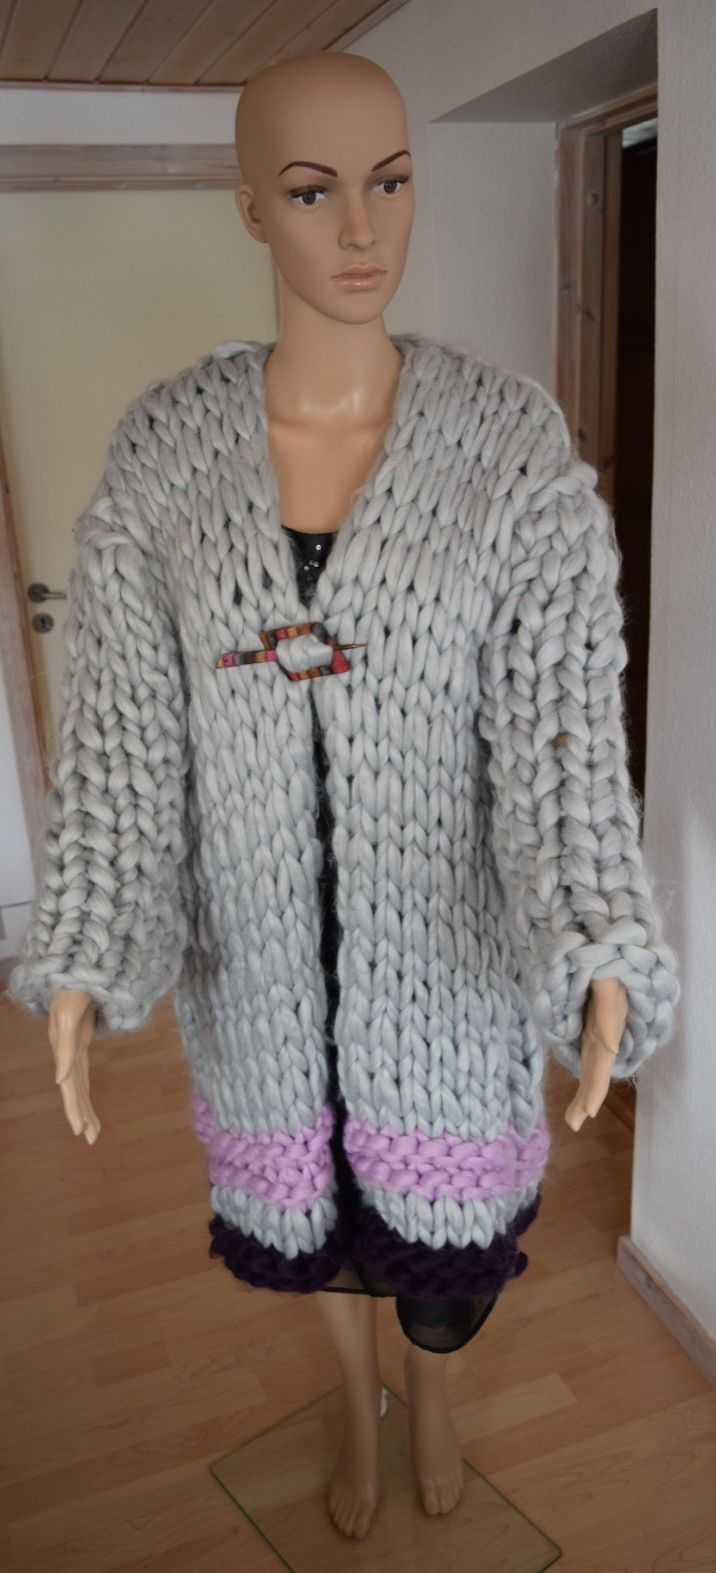 N/A – Chunky jakke / cardigan strikkekit i størrelse xxl/xxxl fra elmelydesign.dk